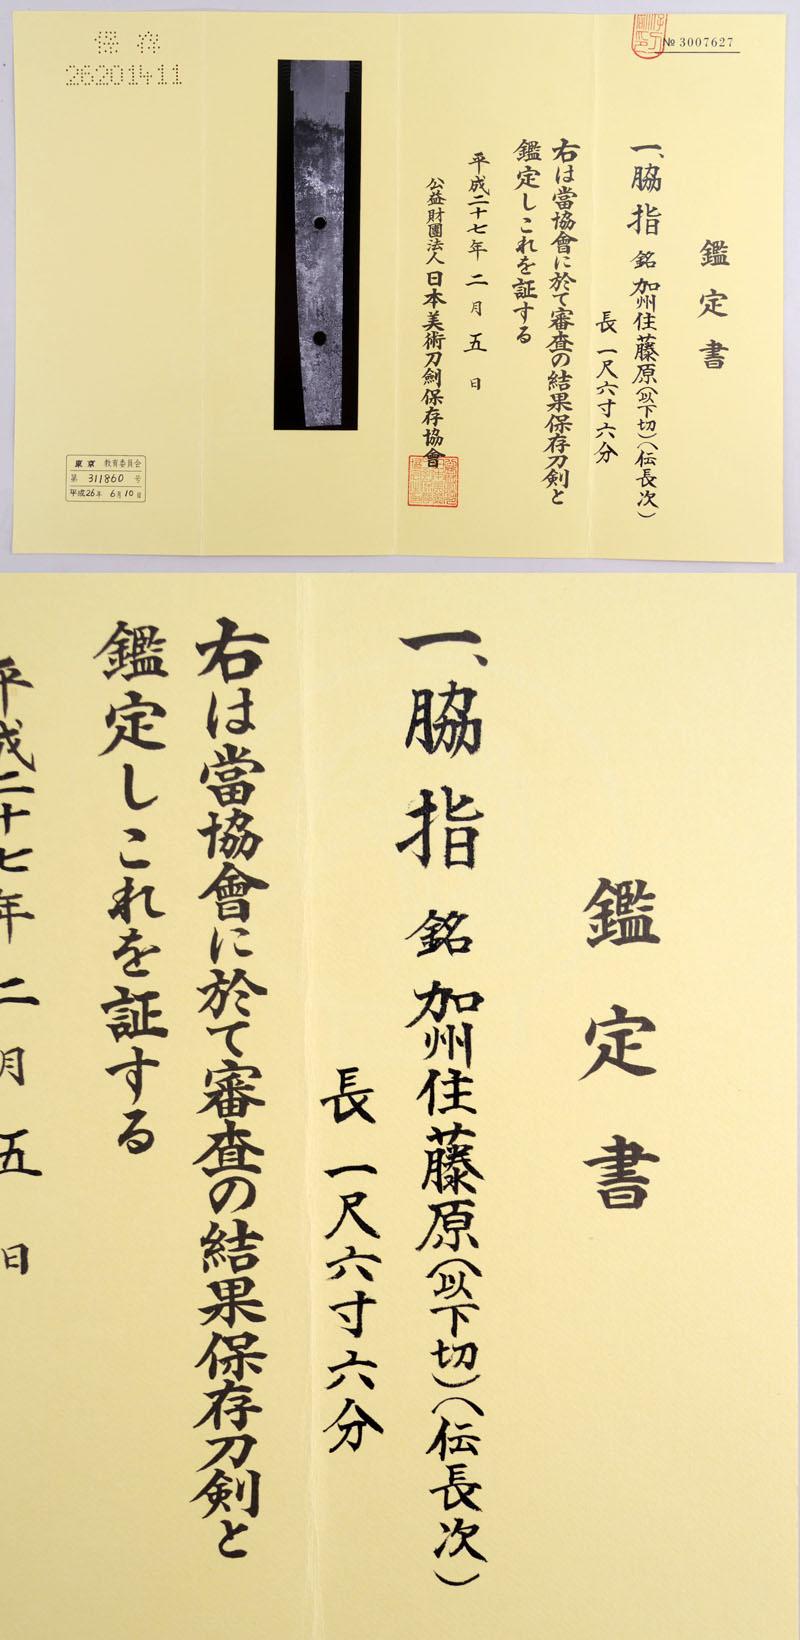 加州住藤原(以下切)(伝長次) Picture of Certificate